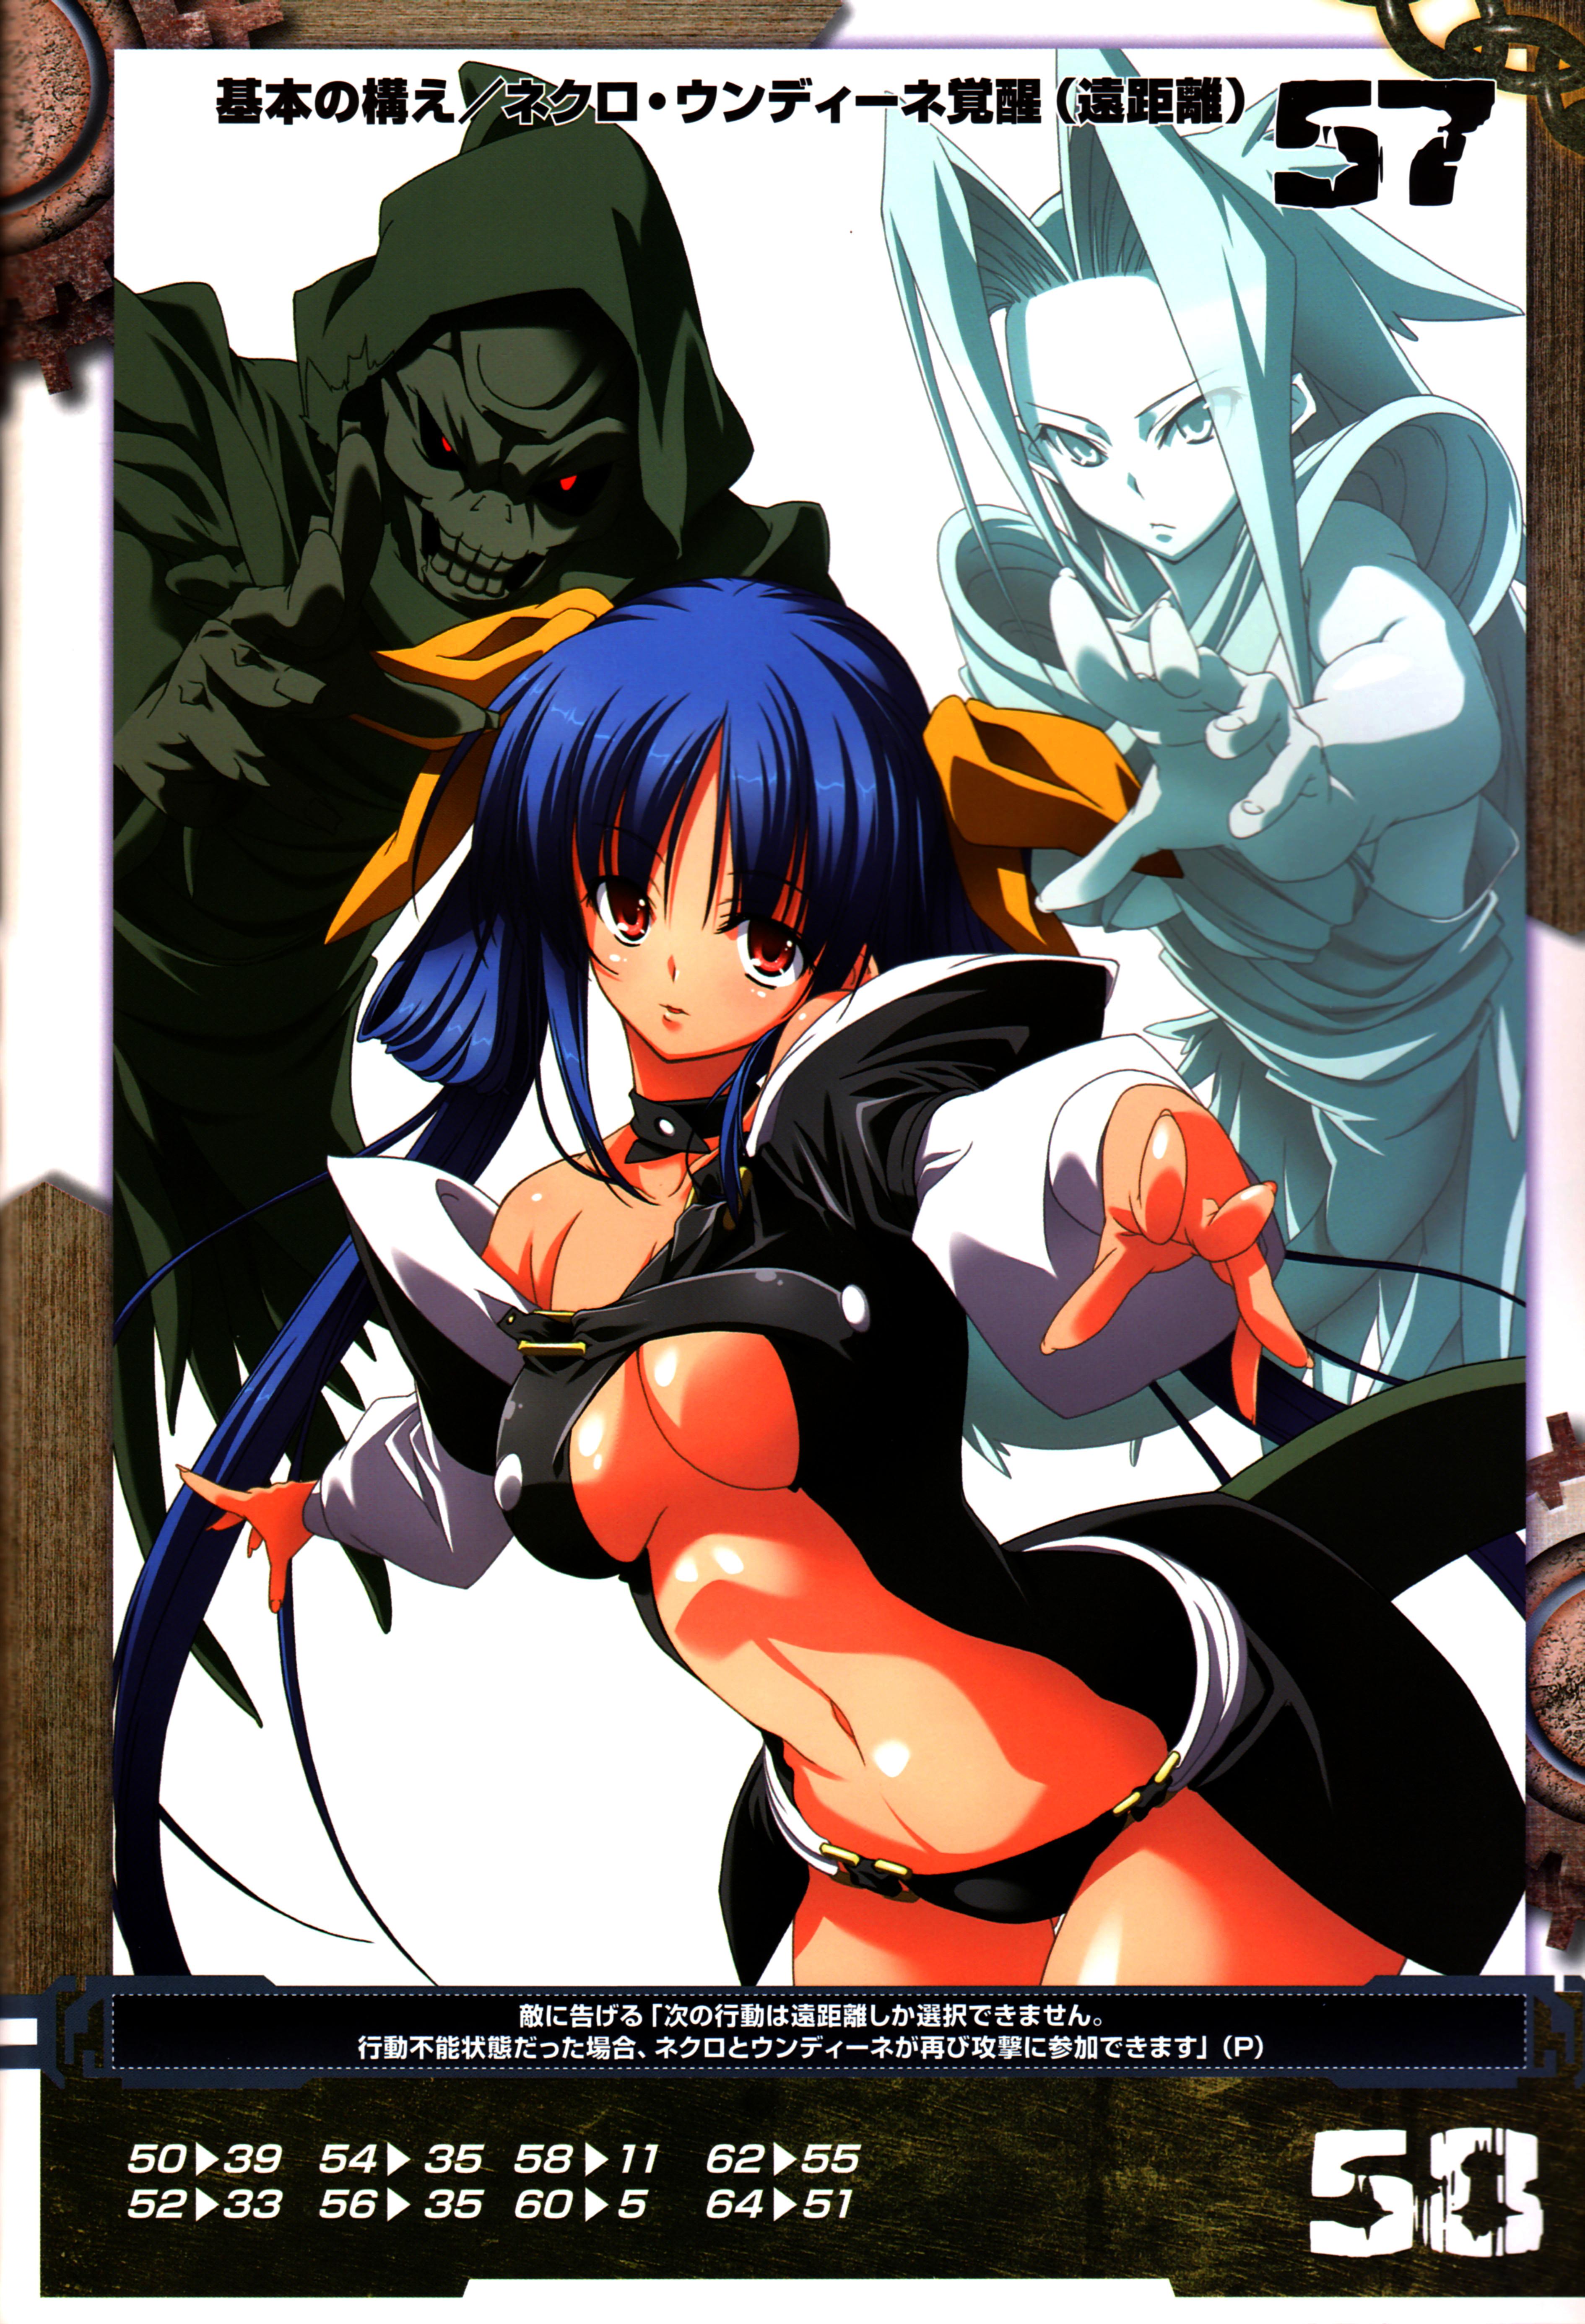 Alice - Queens Blade Wiki - Queens Blade: Rebellion